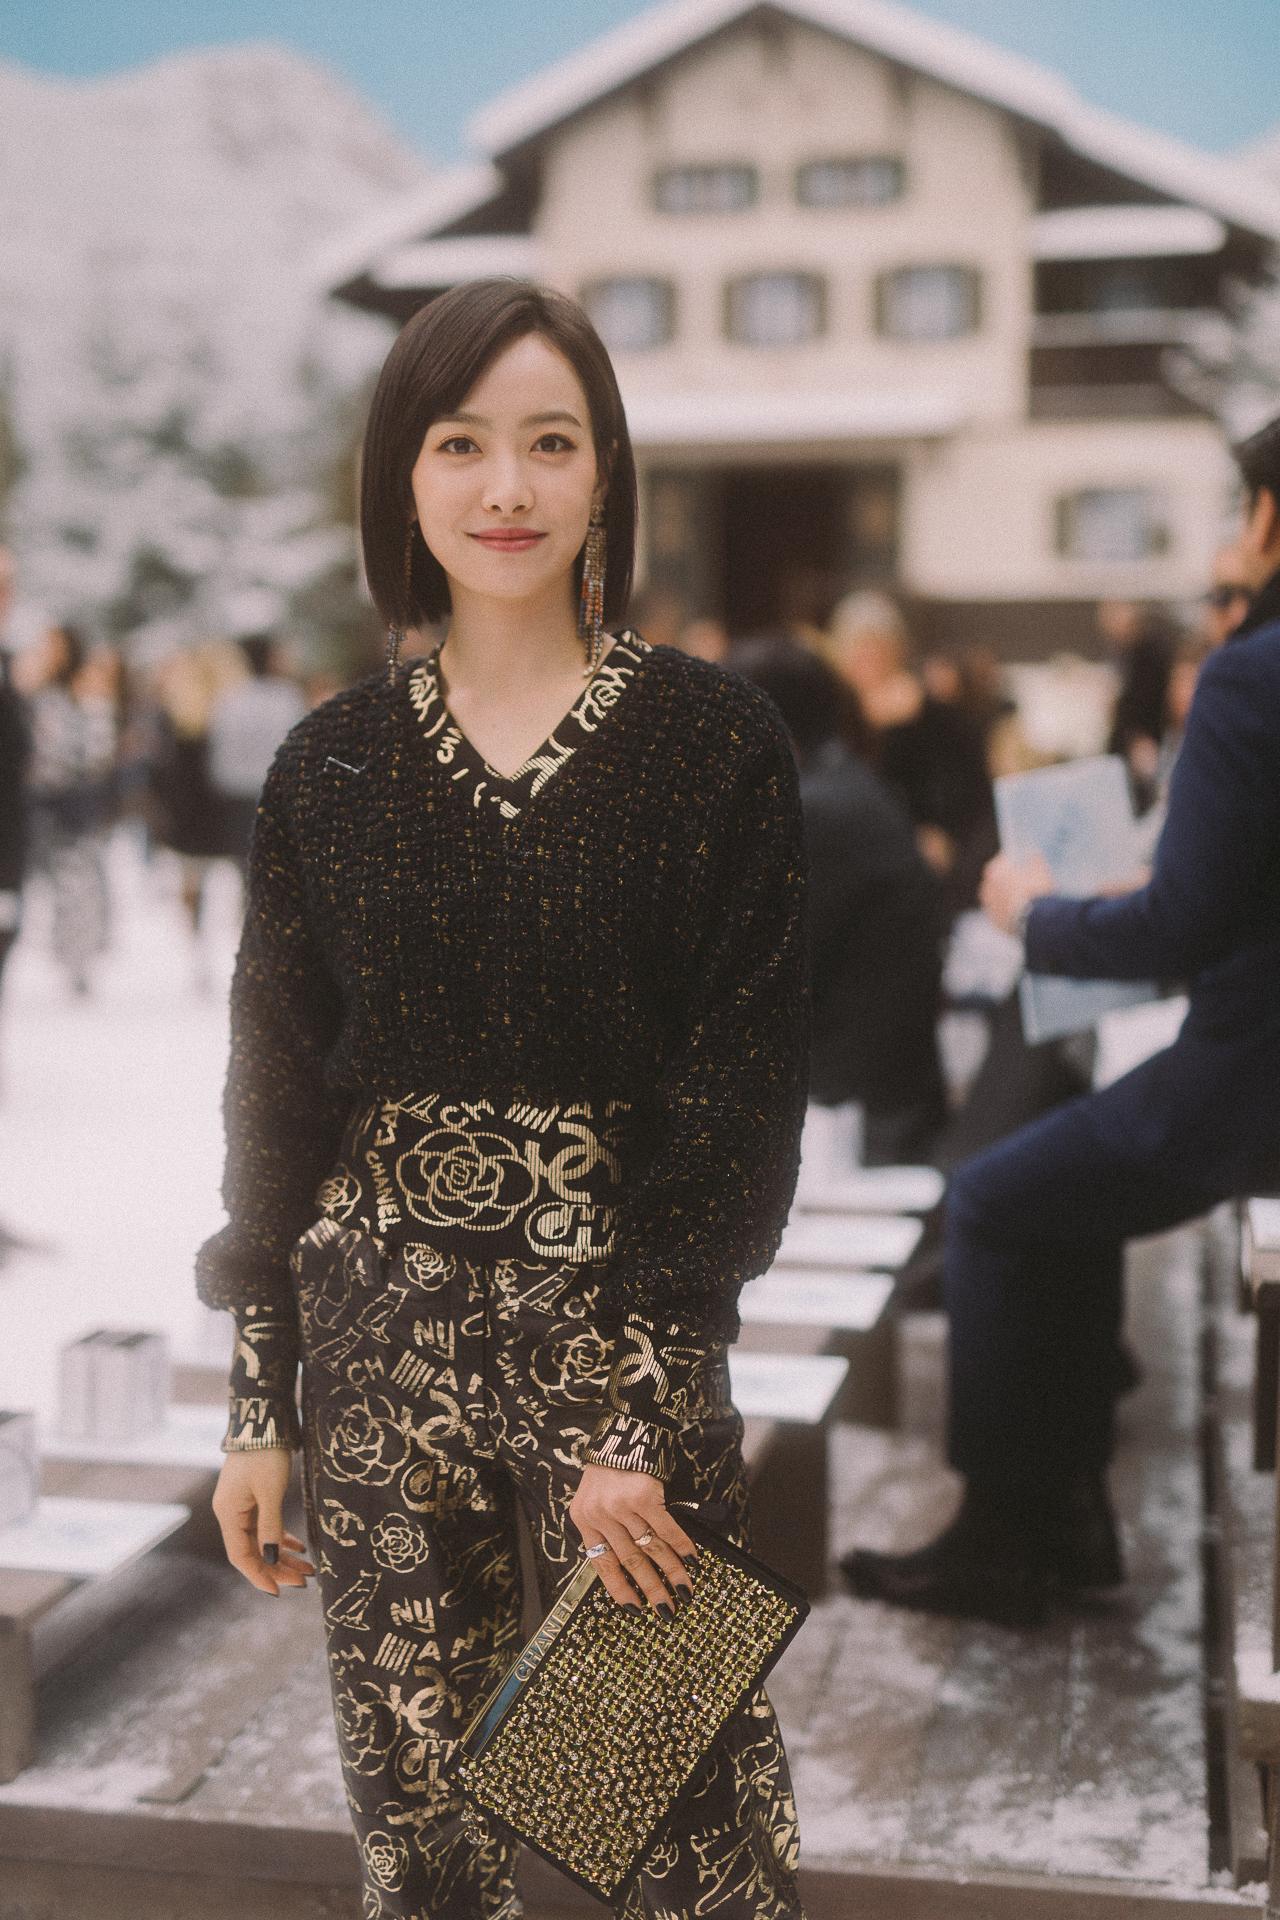 Victoria Song bst chanel thu - đông 2019 jennie kim 88